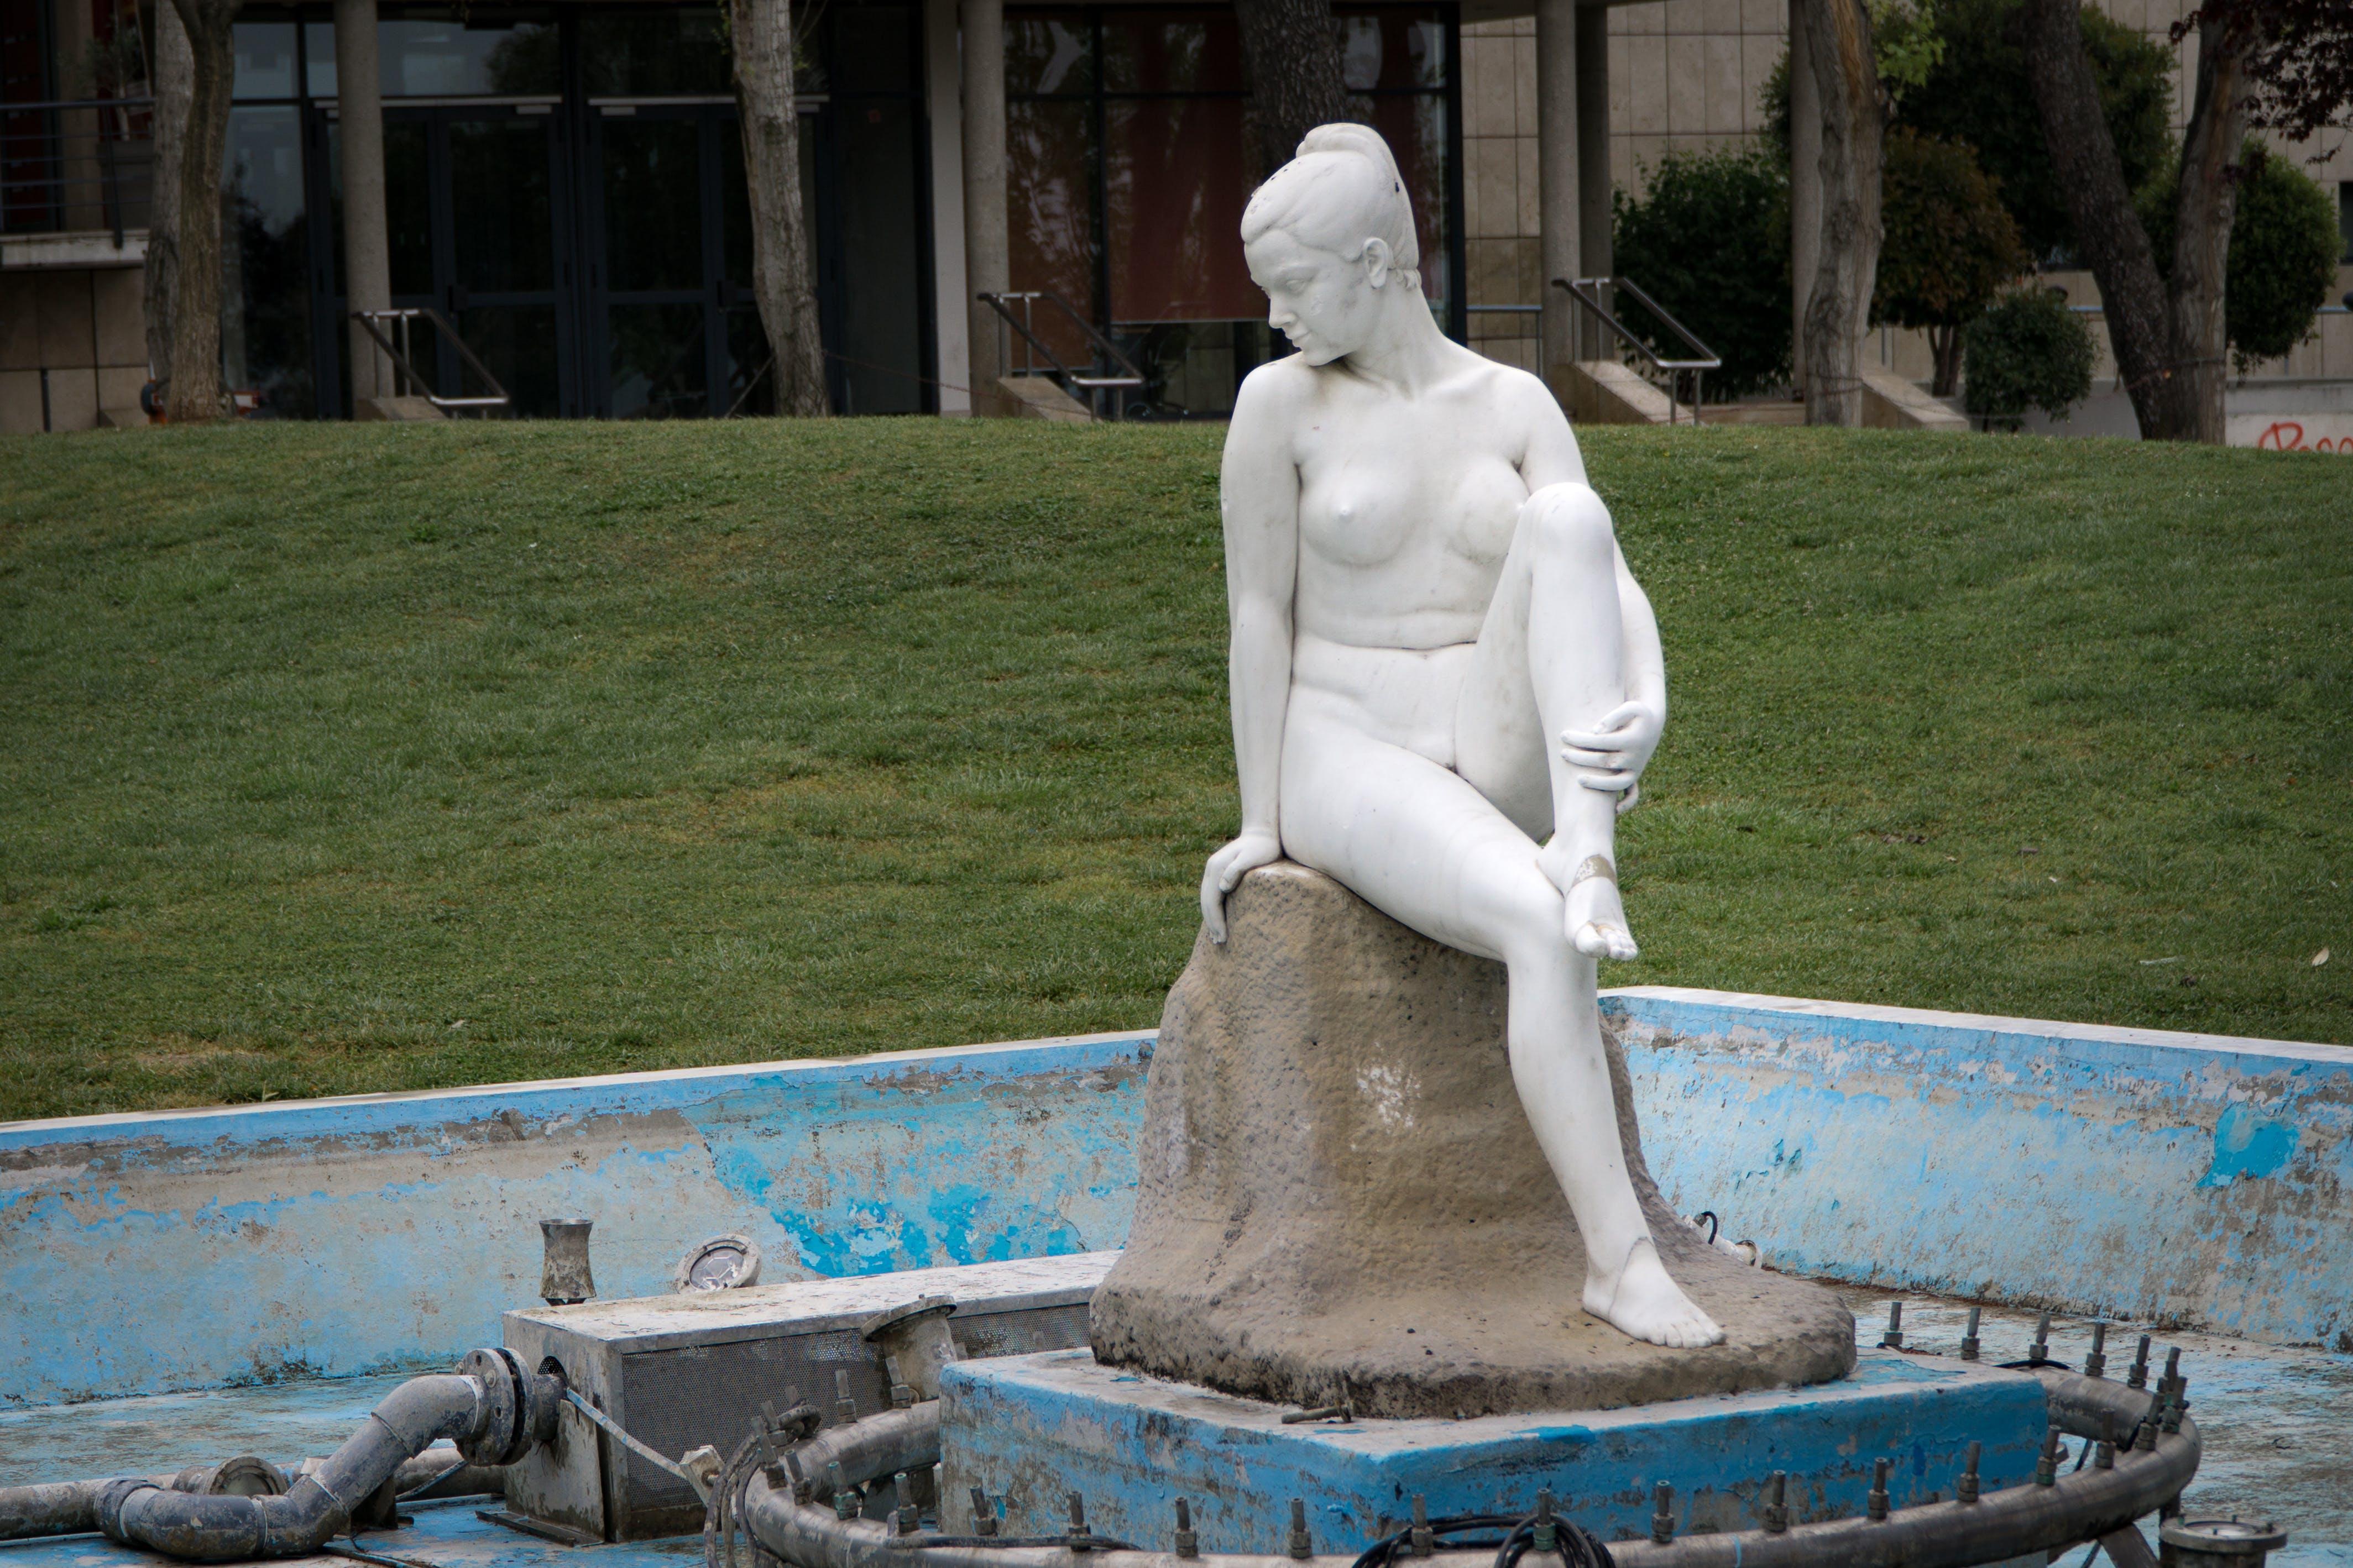 Naked Woman White Concrete Statue Near Green Grass